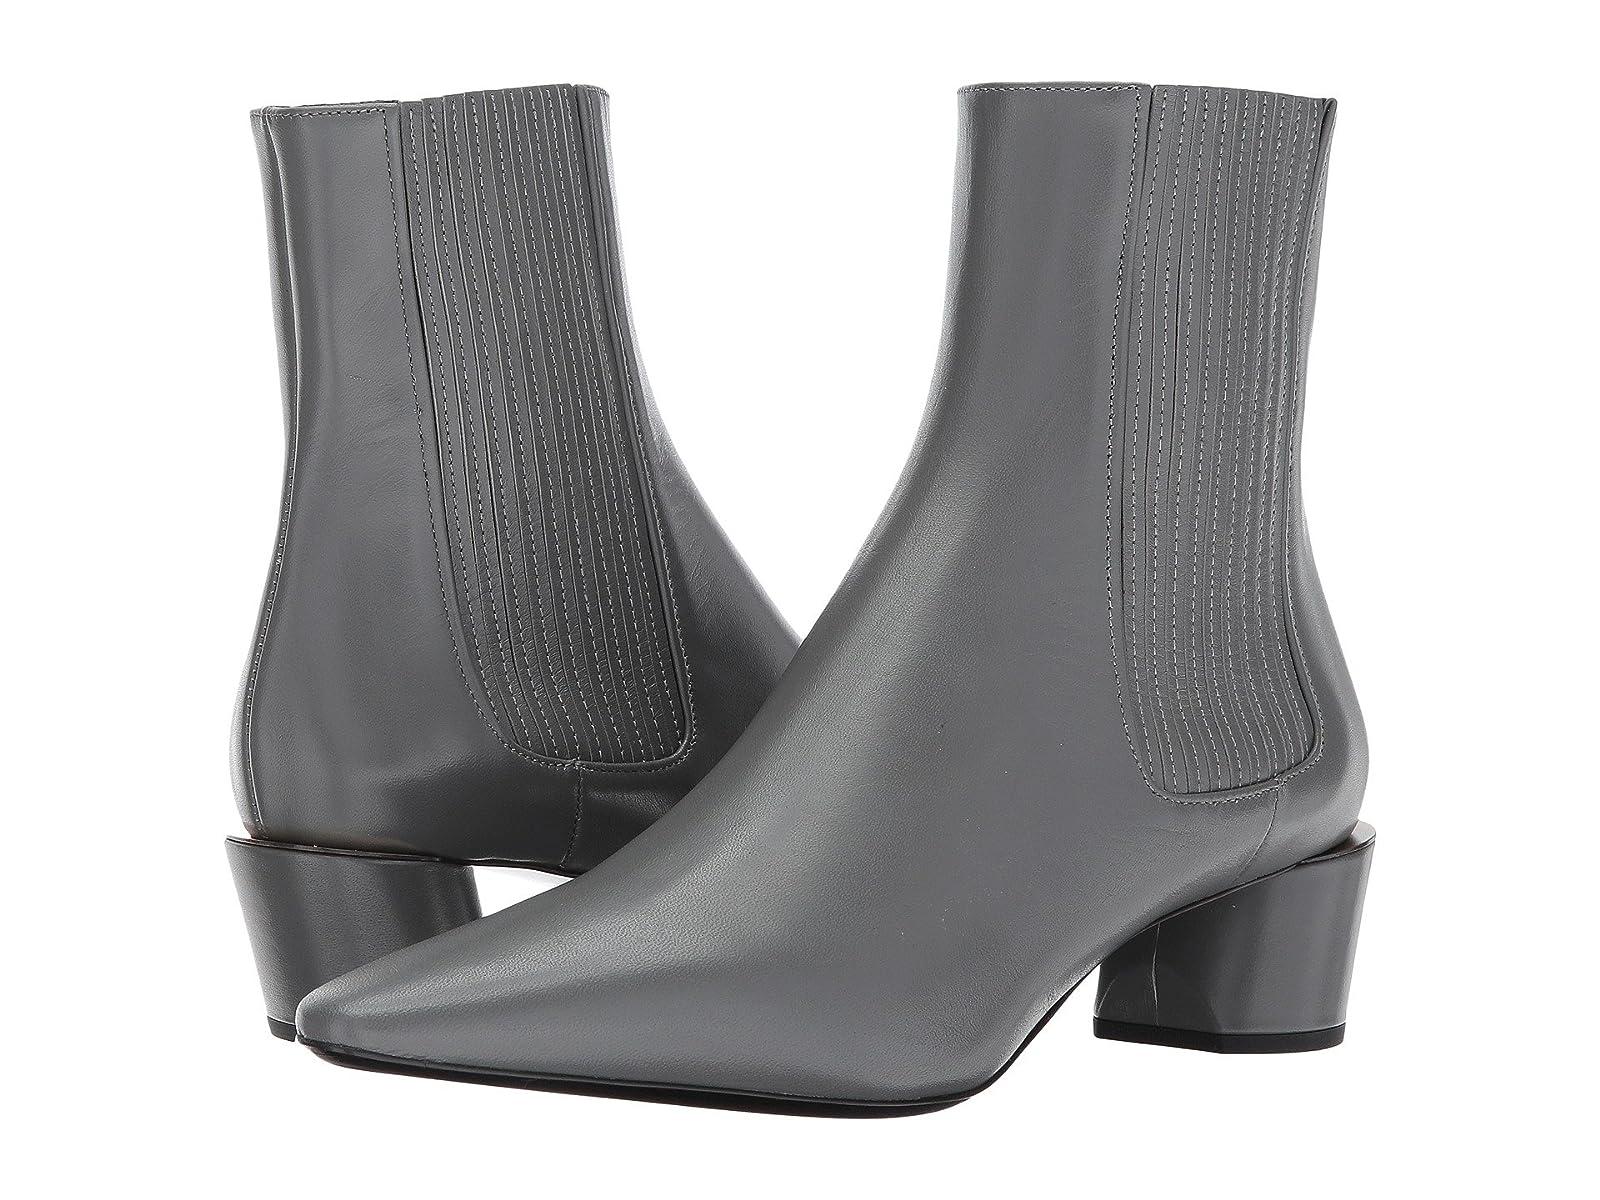 Jil Sander JS29021Cheap and distinctive eye-catching shoes